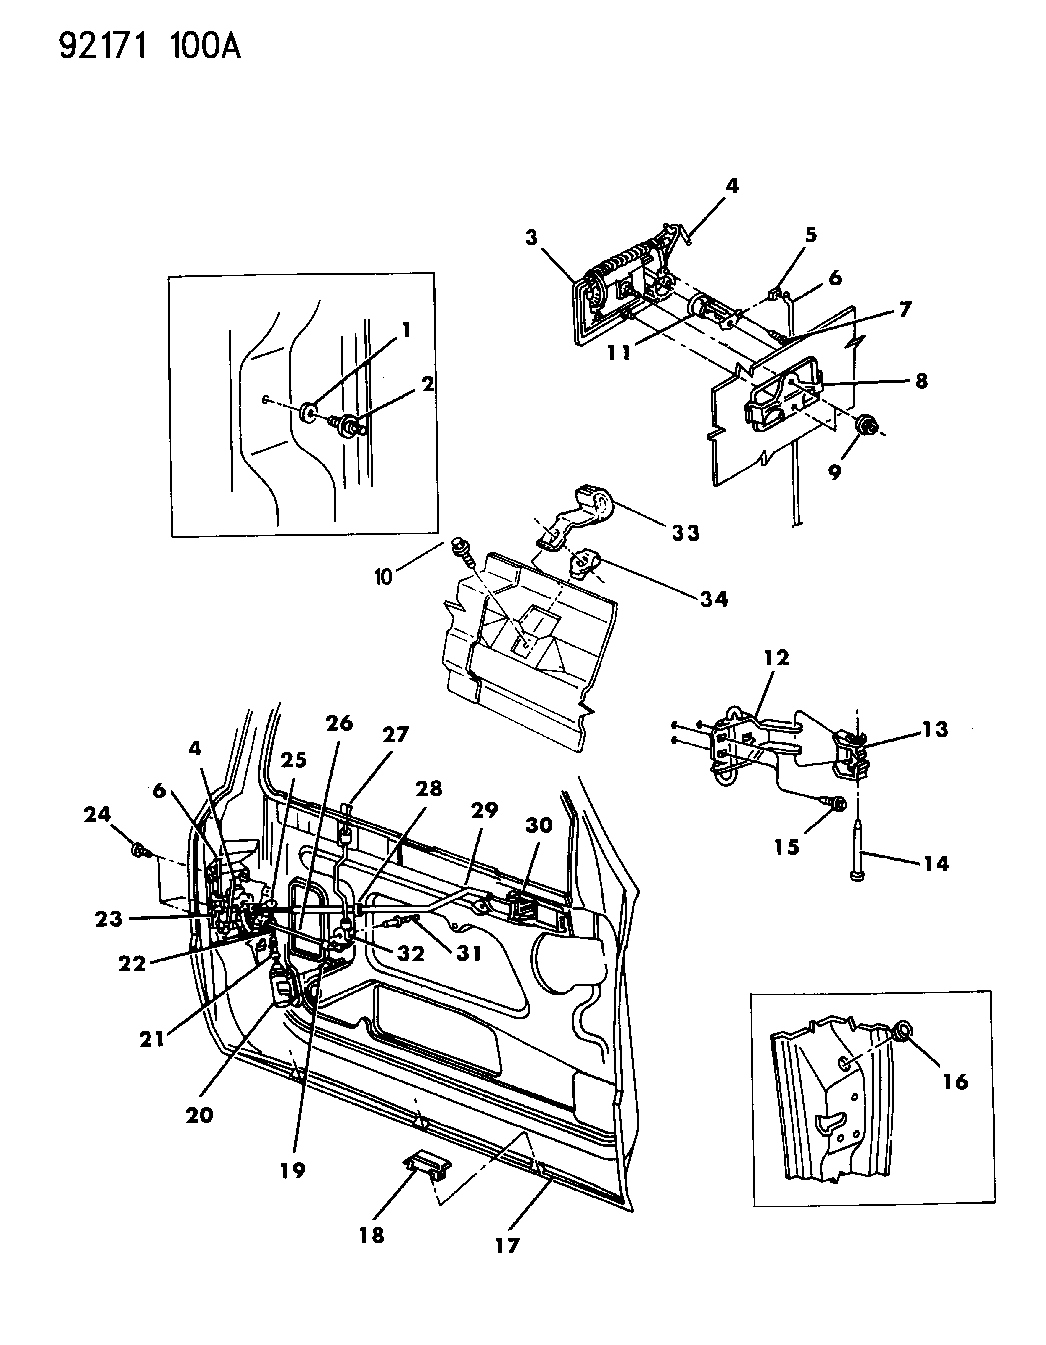 1992 Dodge Shadow Door, Front Shell, Handles And Locks